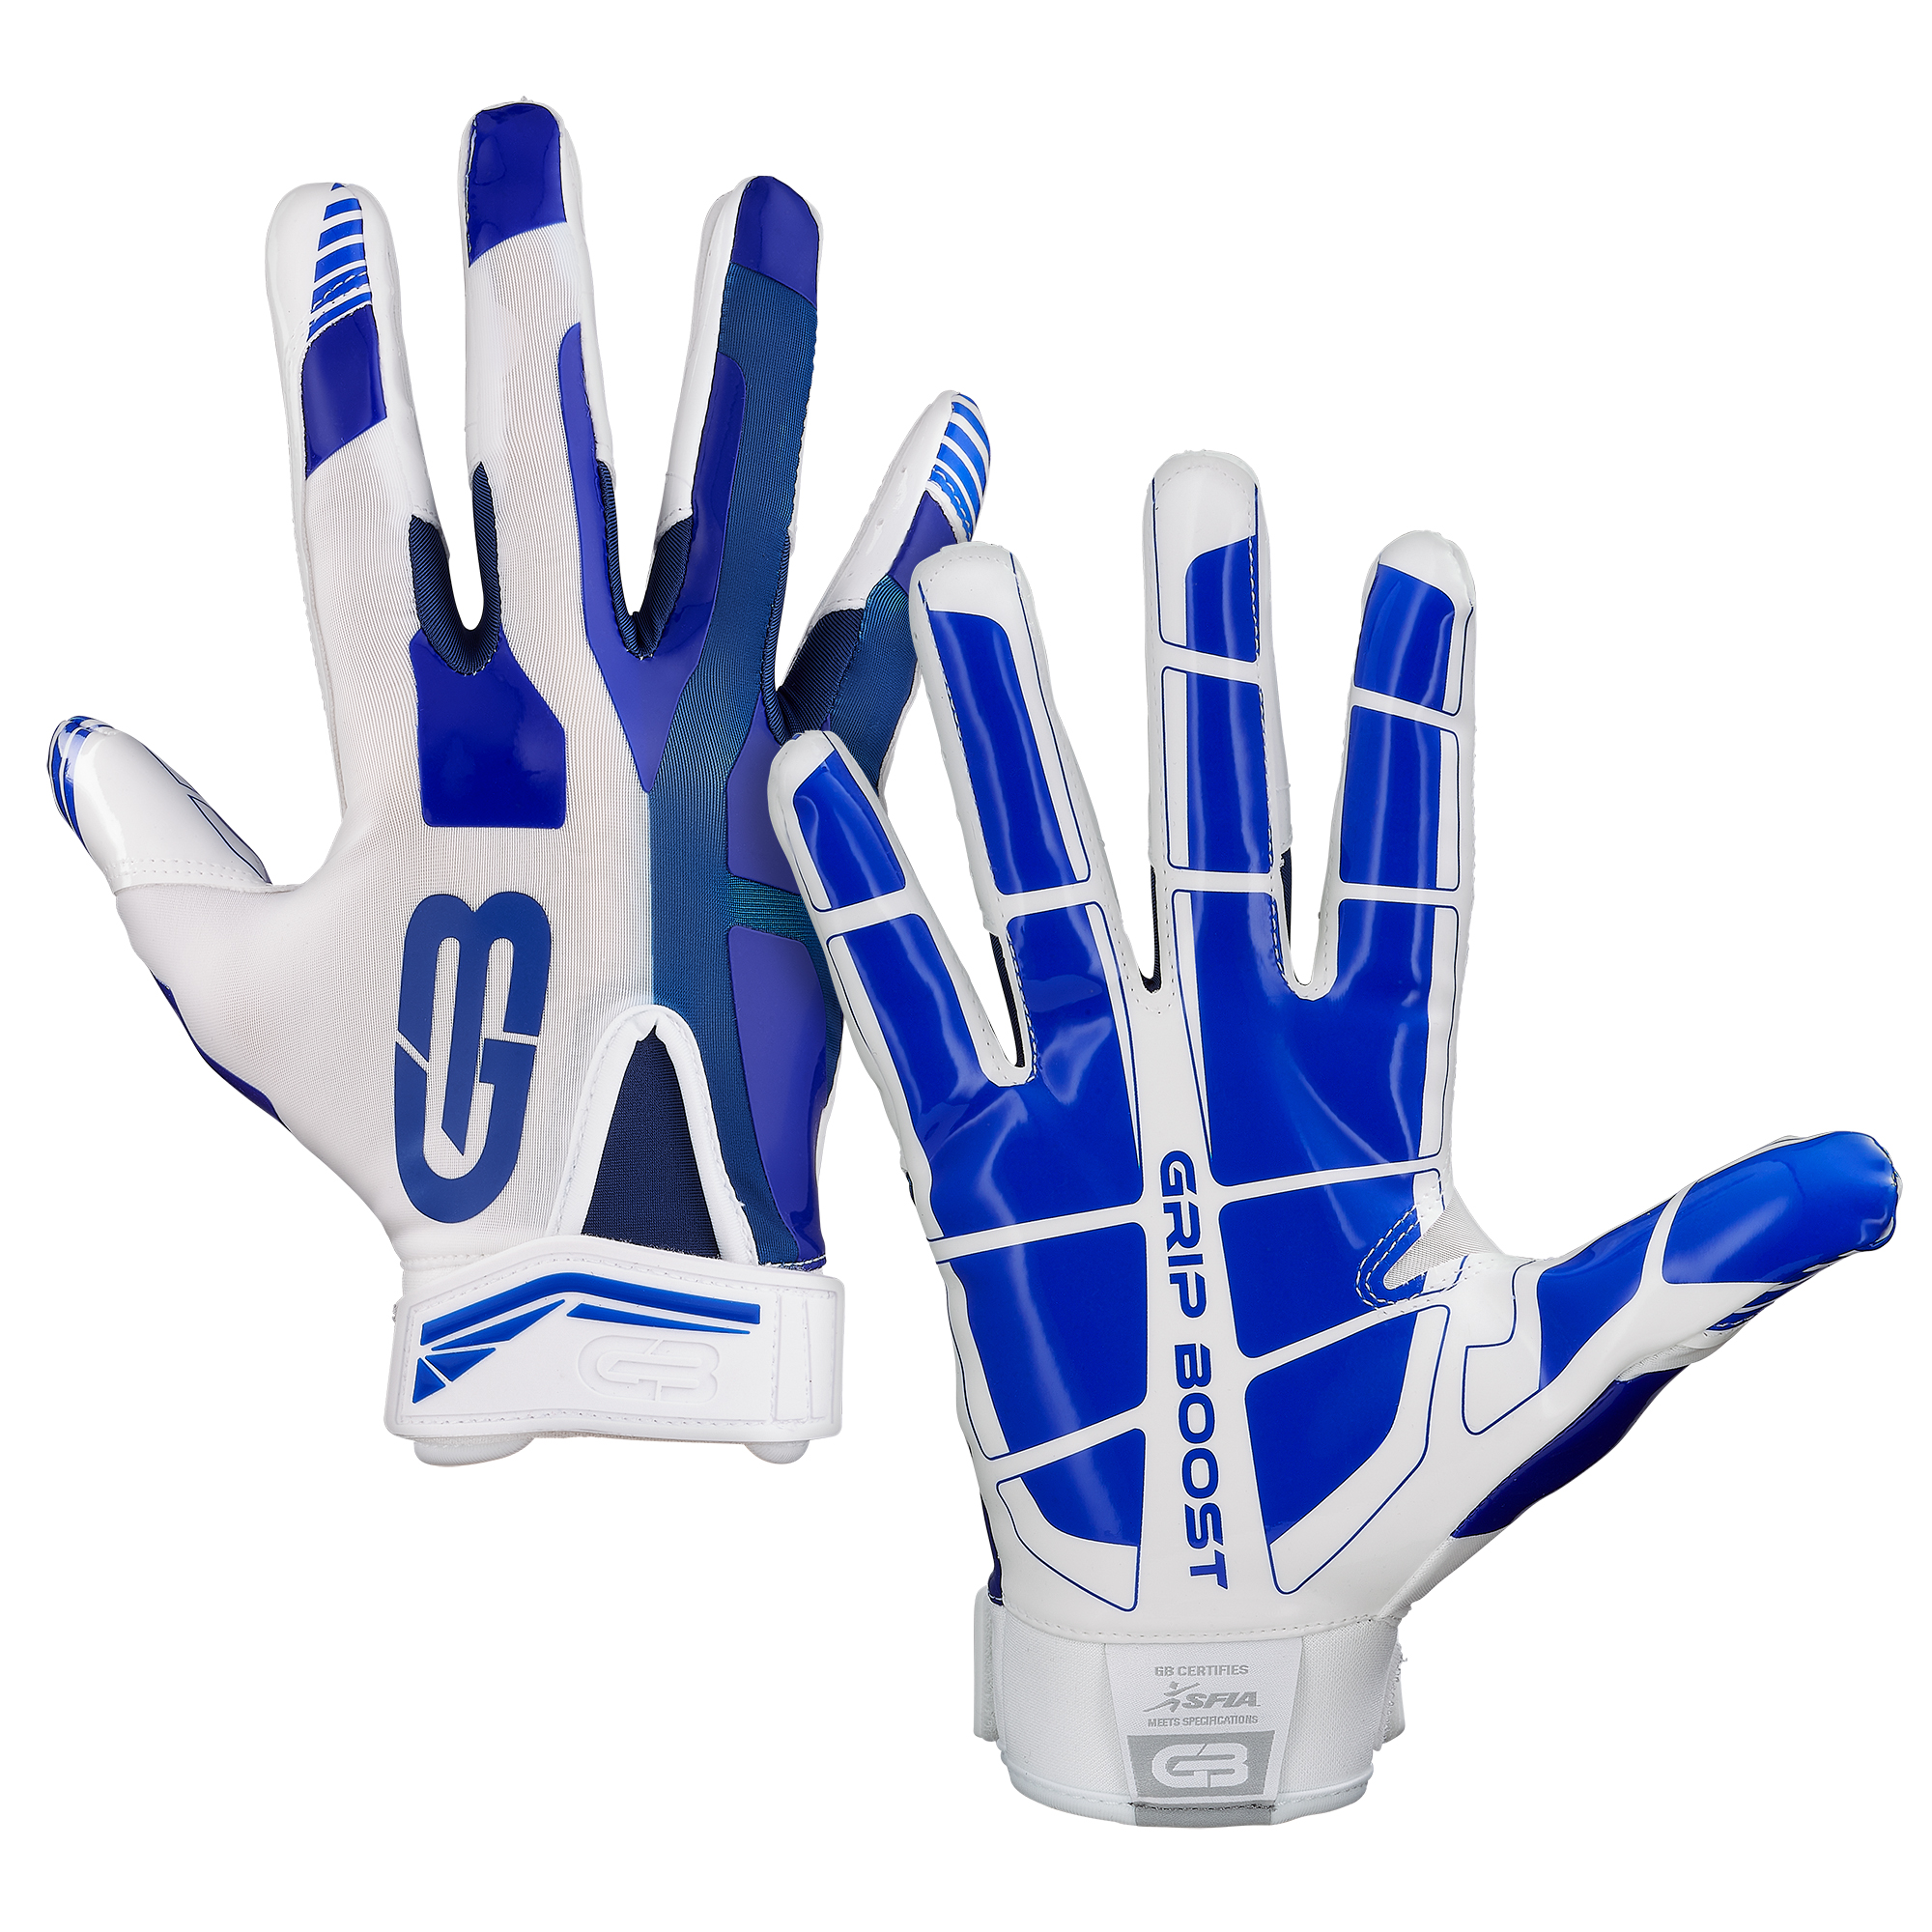 Grip Boost Stealth Football Gloves Pro Elite